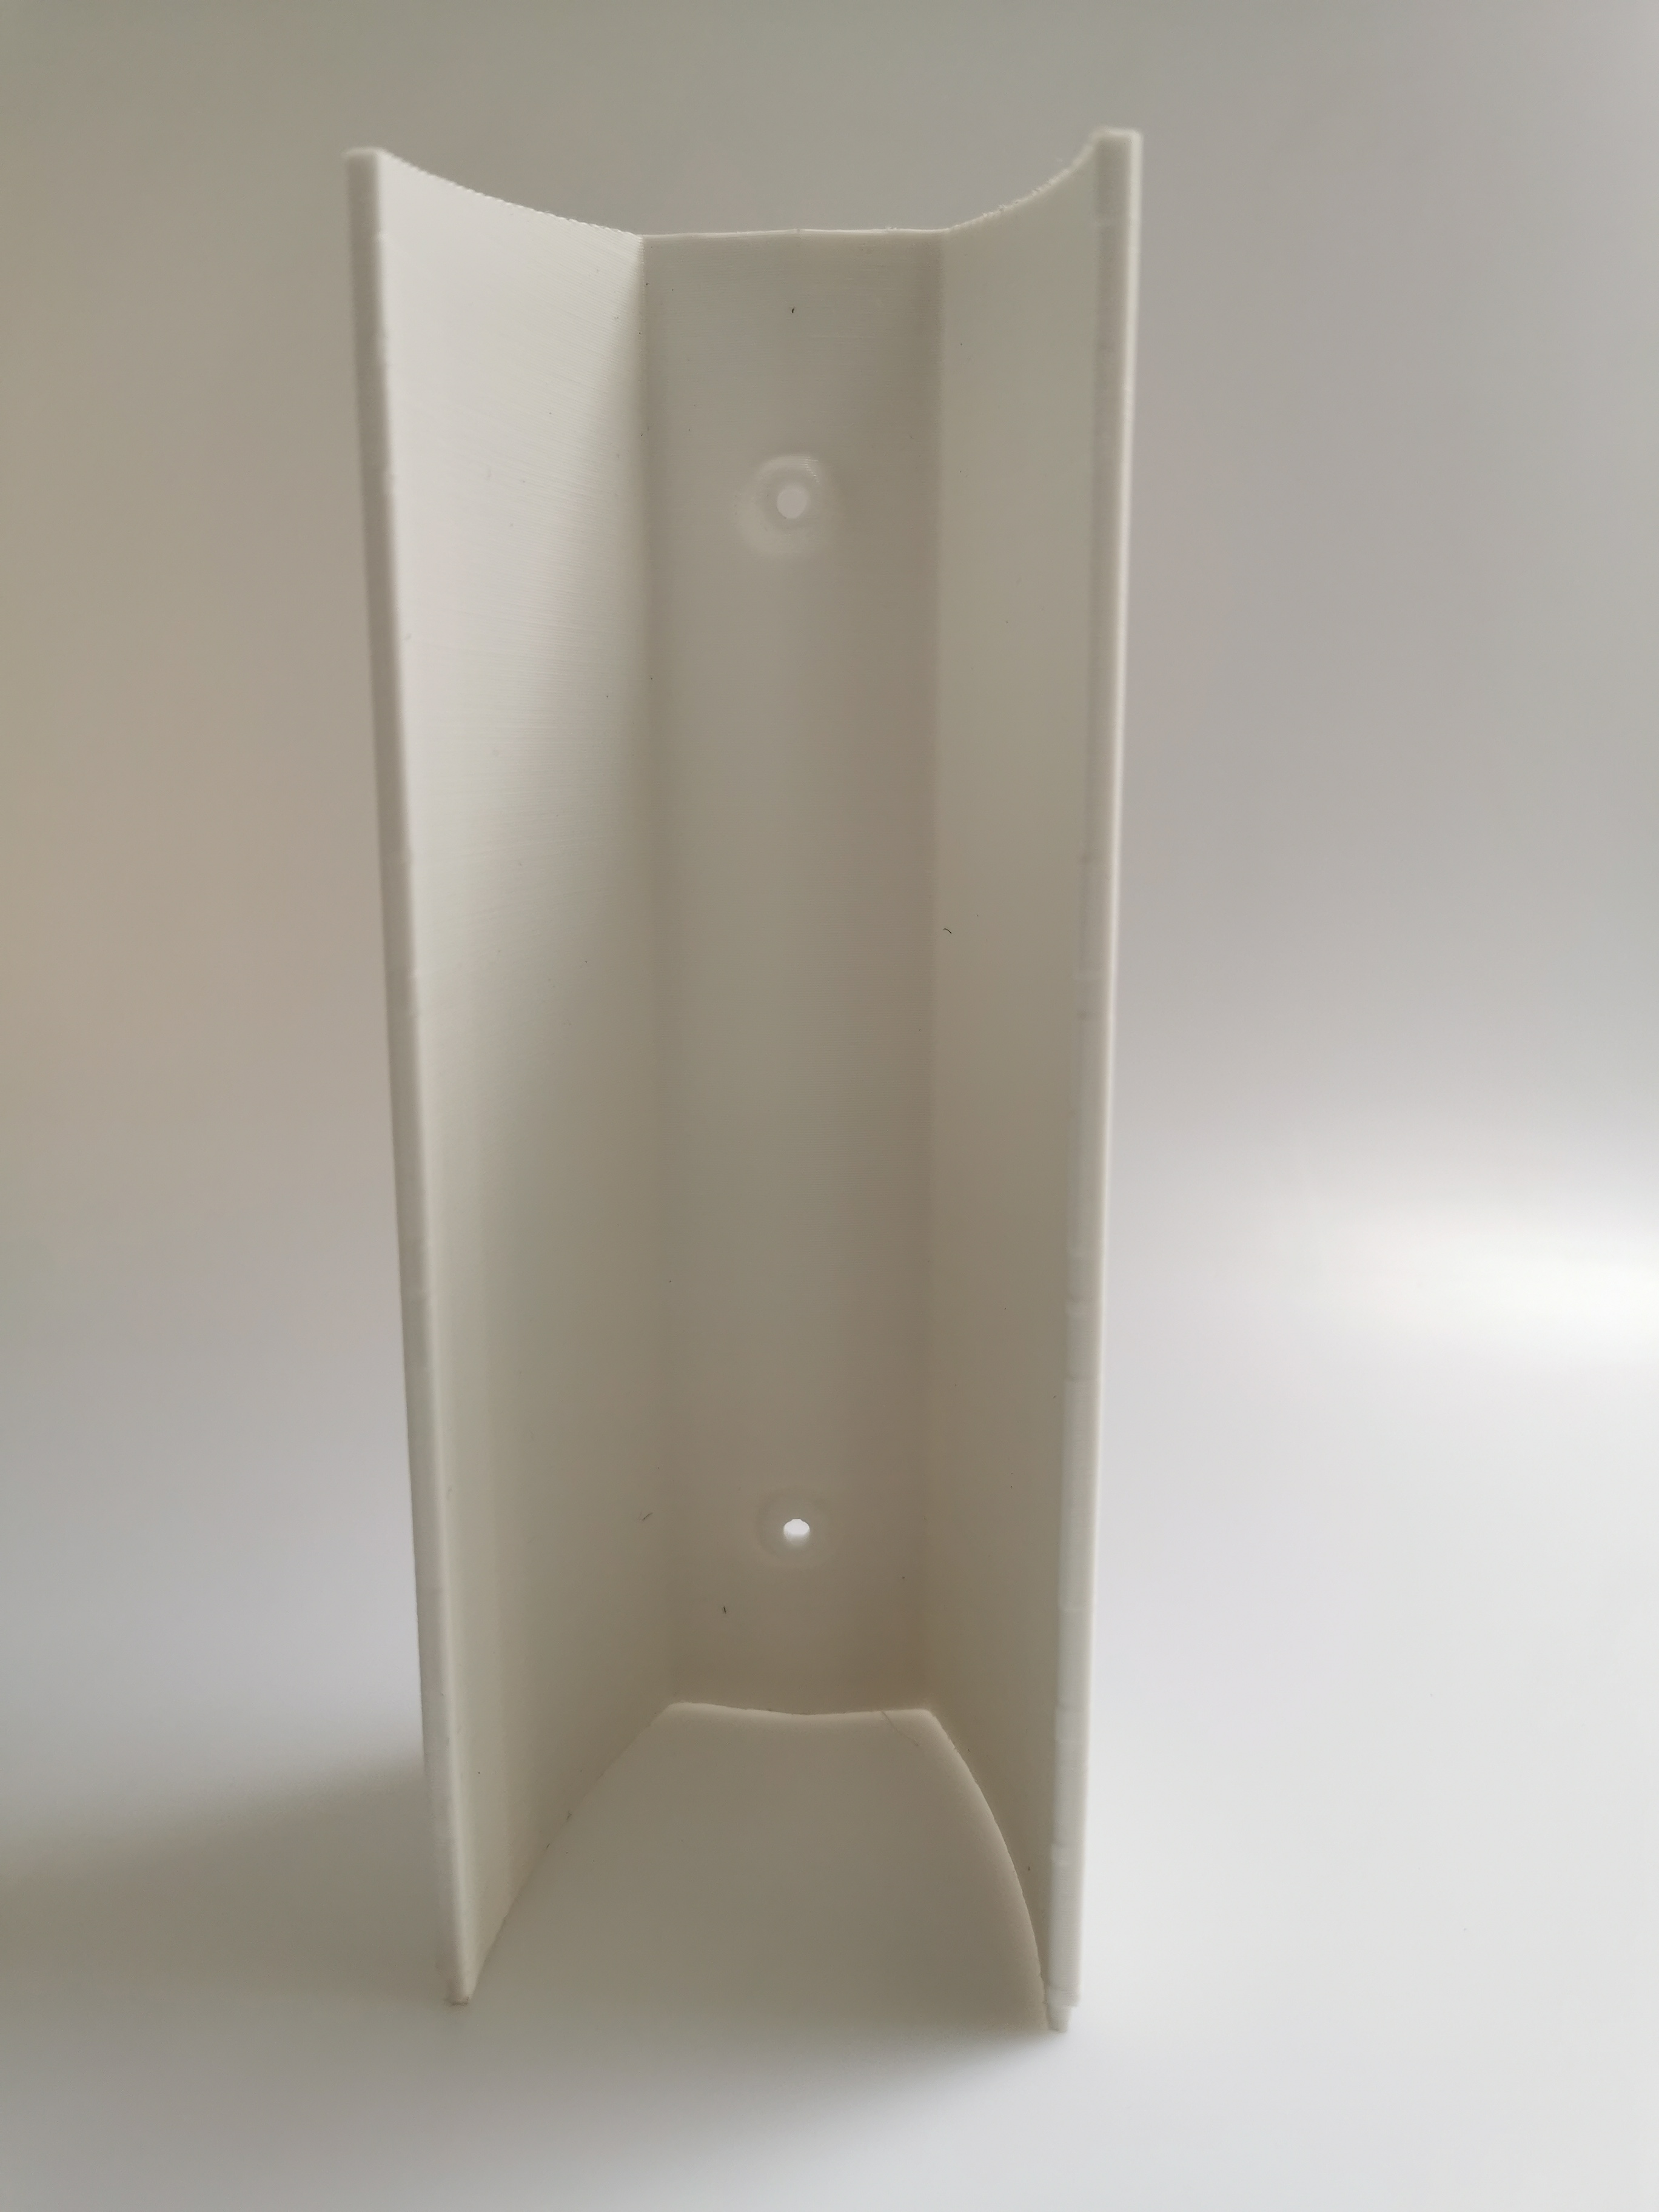 Model for metal casting